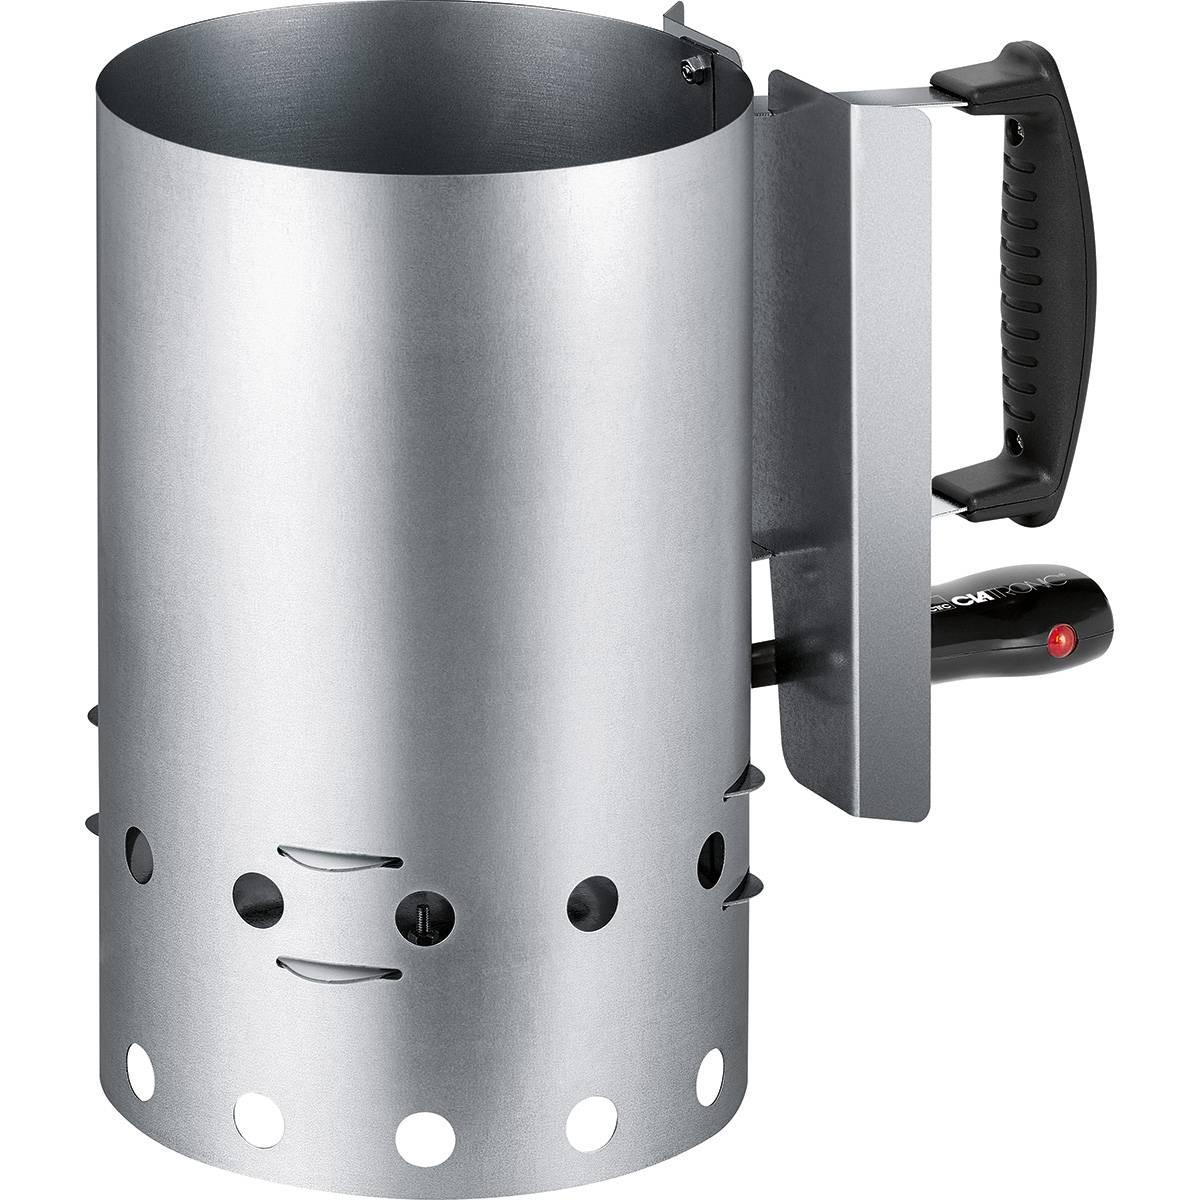 Clatronic Encendedor eléctrico barbacoas para carbon 1.5Kg EGA 3662